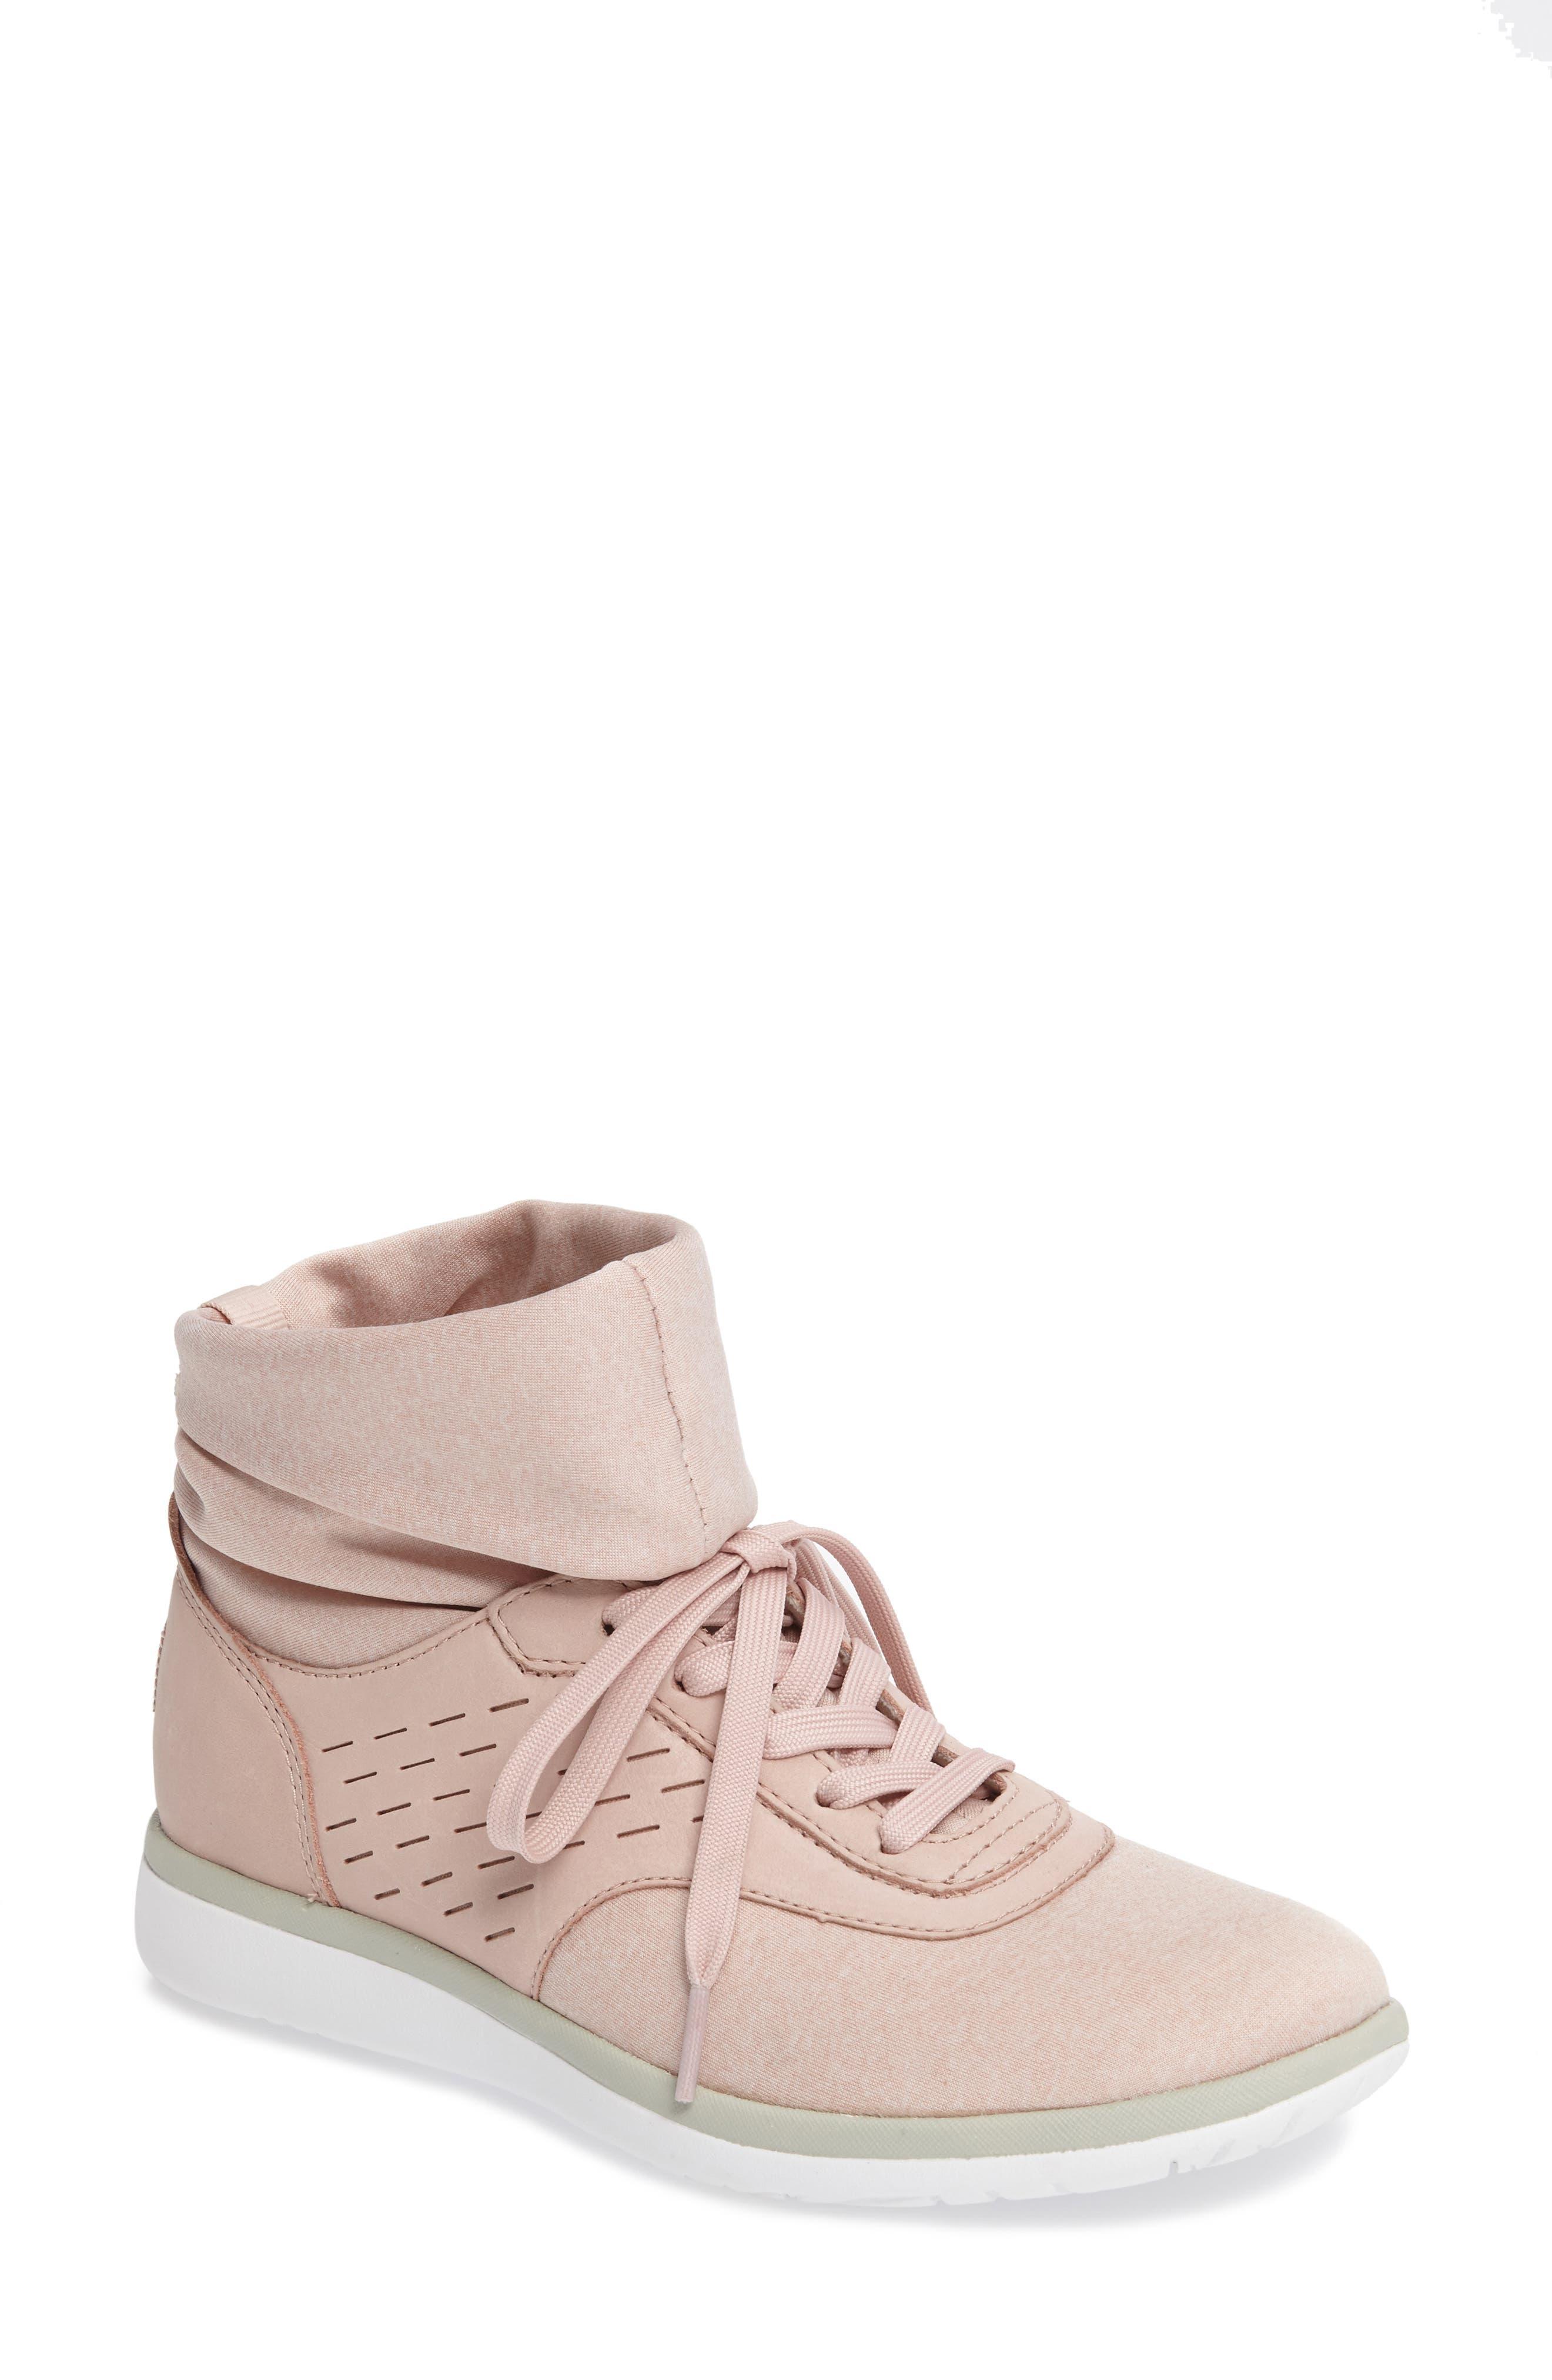 Main Image - UGG® Islay High Top Sneaker (Women)